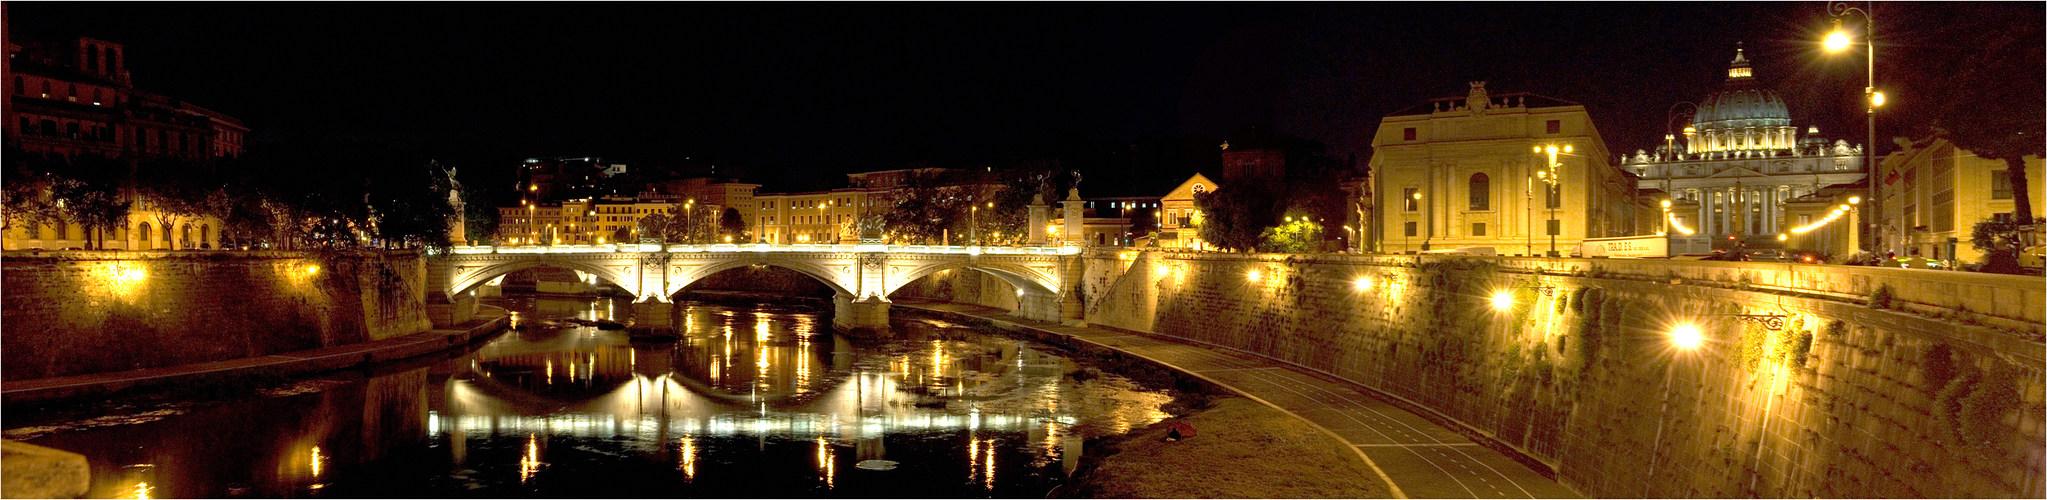 Tiberbrücke und Petersdom